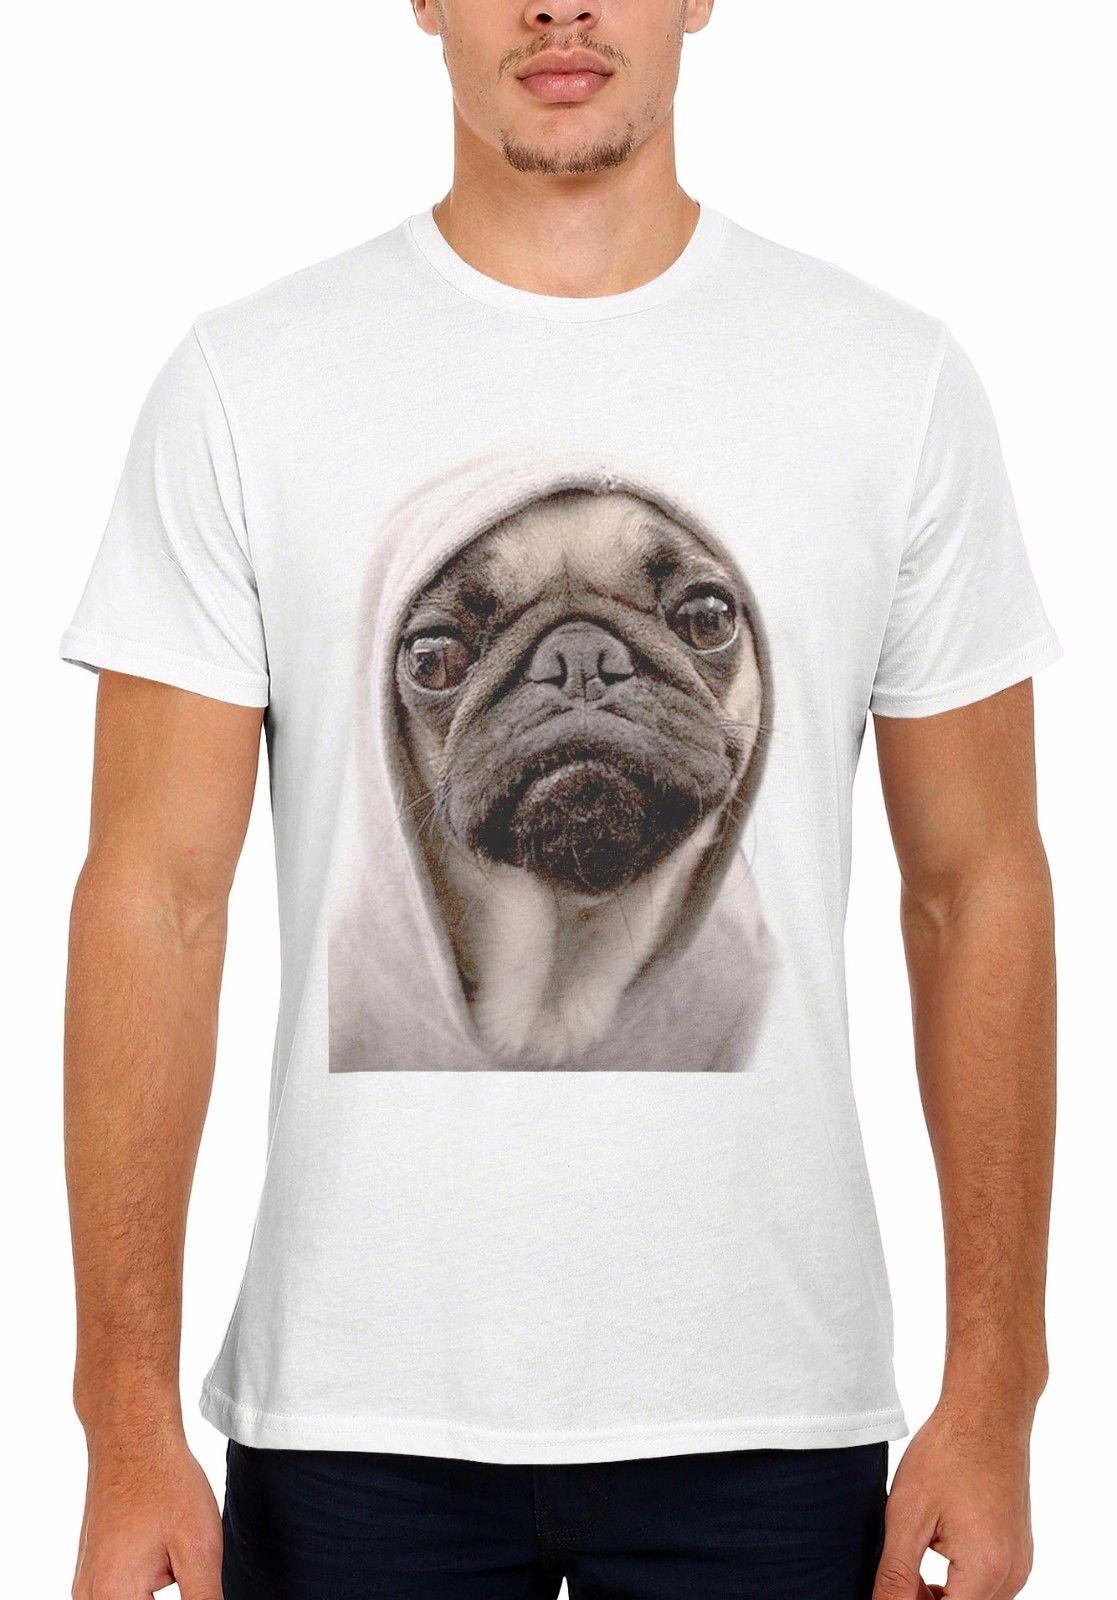 e6361bbb Pug Life Dog Grumpy Animal Funny Cool Men Women Vest Tank Top Unisex T Shirt  355 Fun Tee Shirt Shop Online T Shirts From Onecktshirt, $11.17| DHgate.Com